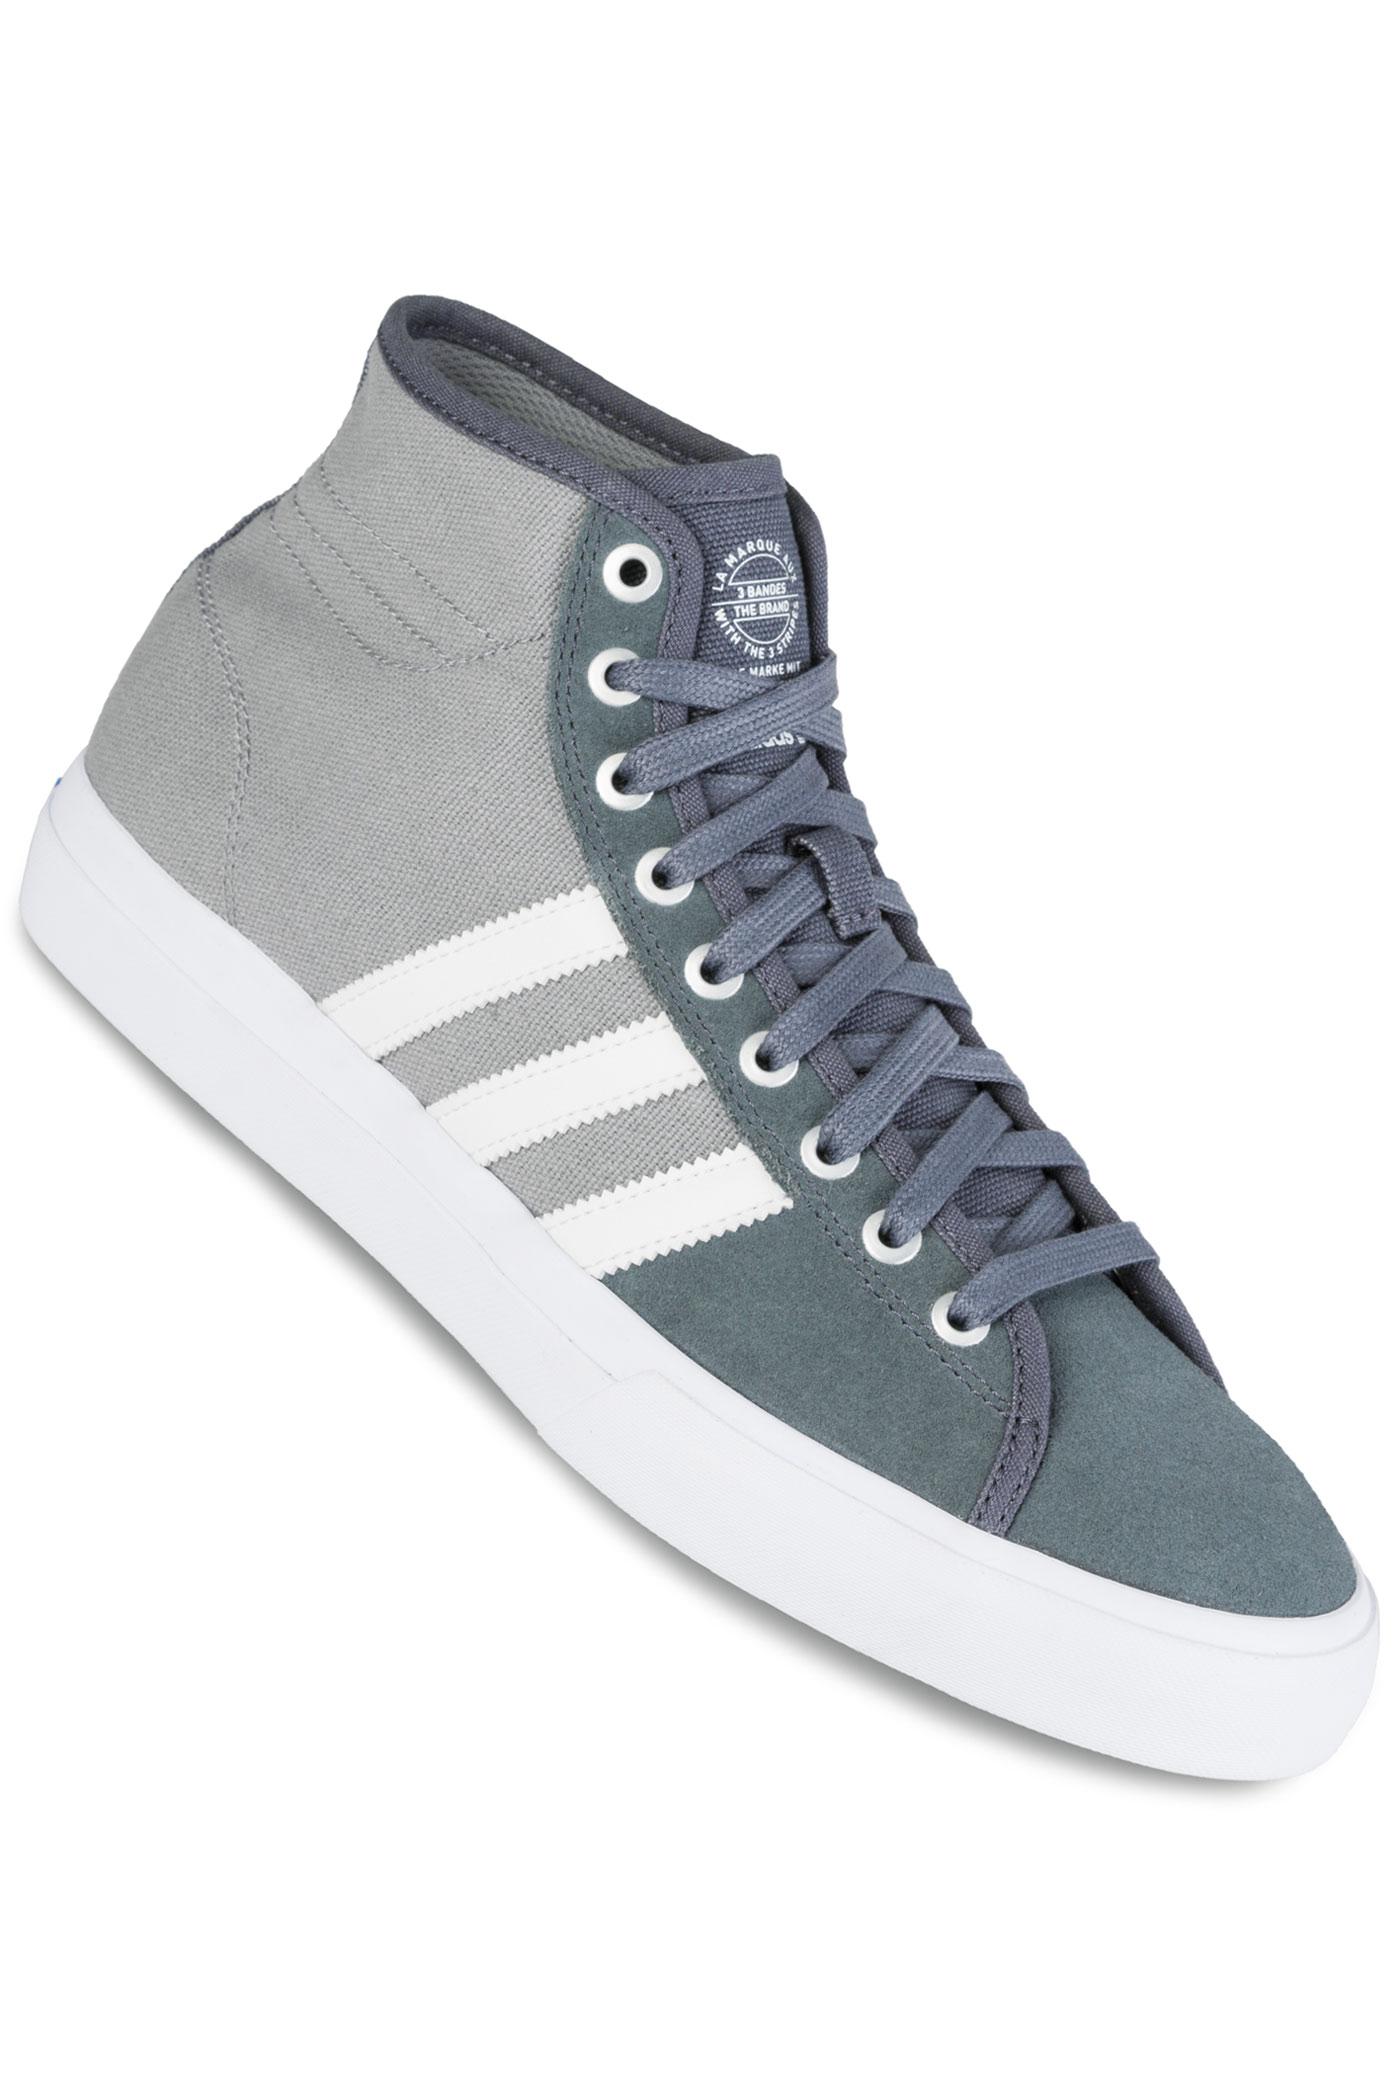 adidas Matchcourt RX MJ Black Shoes